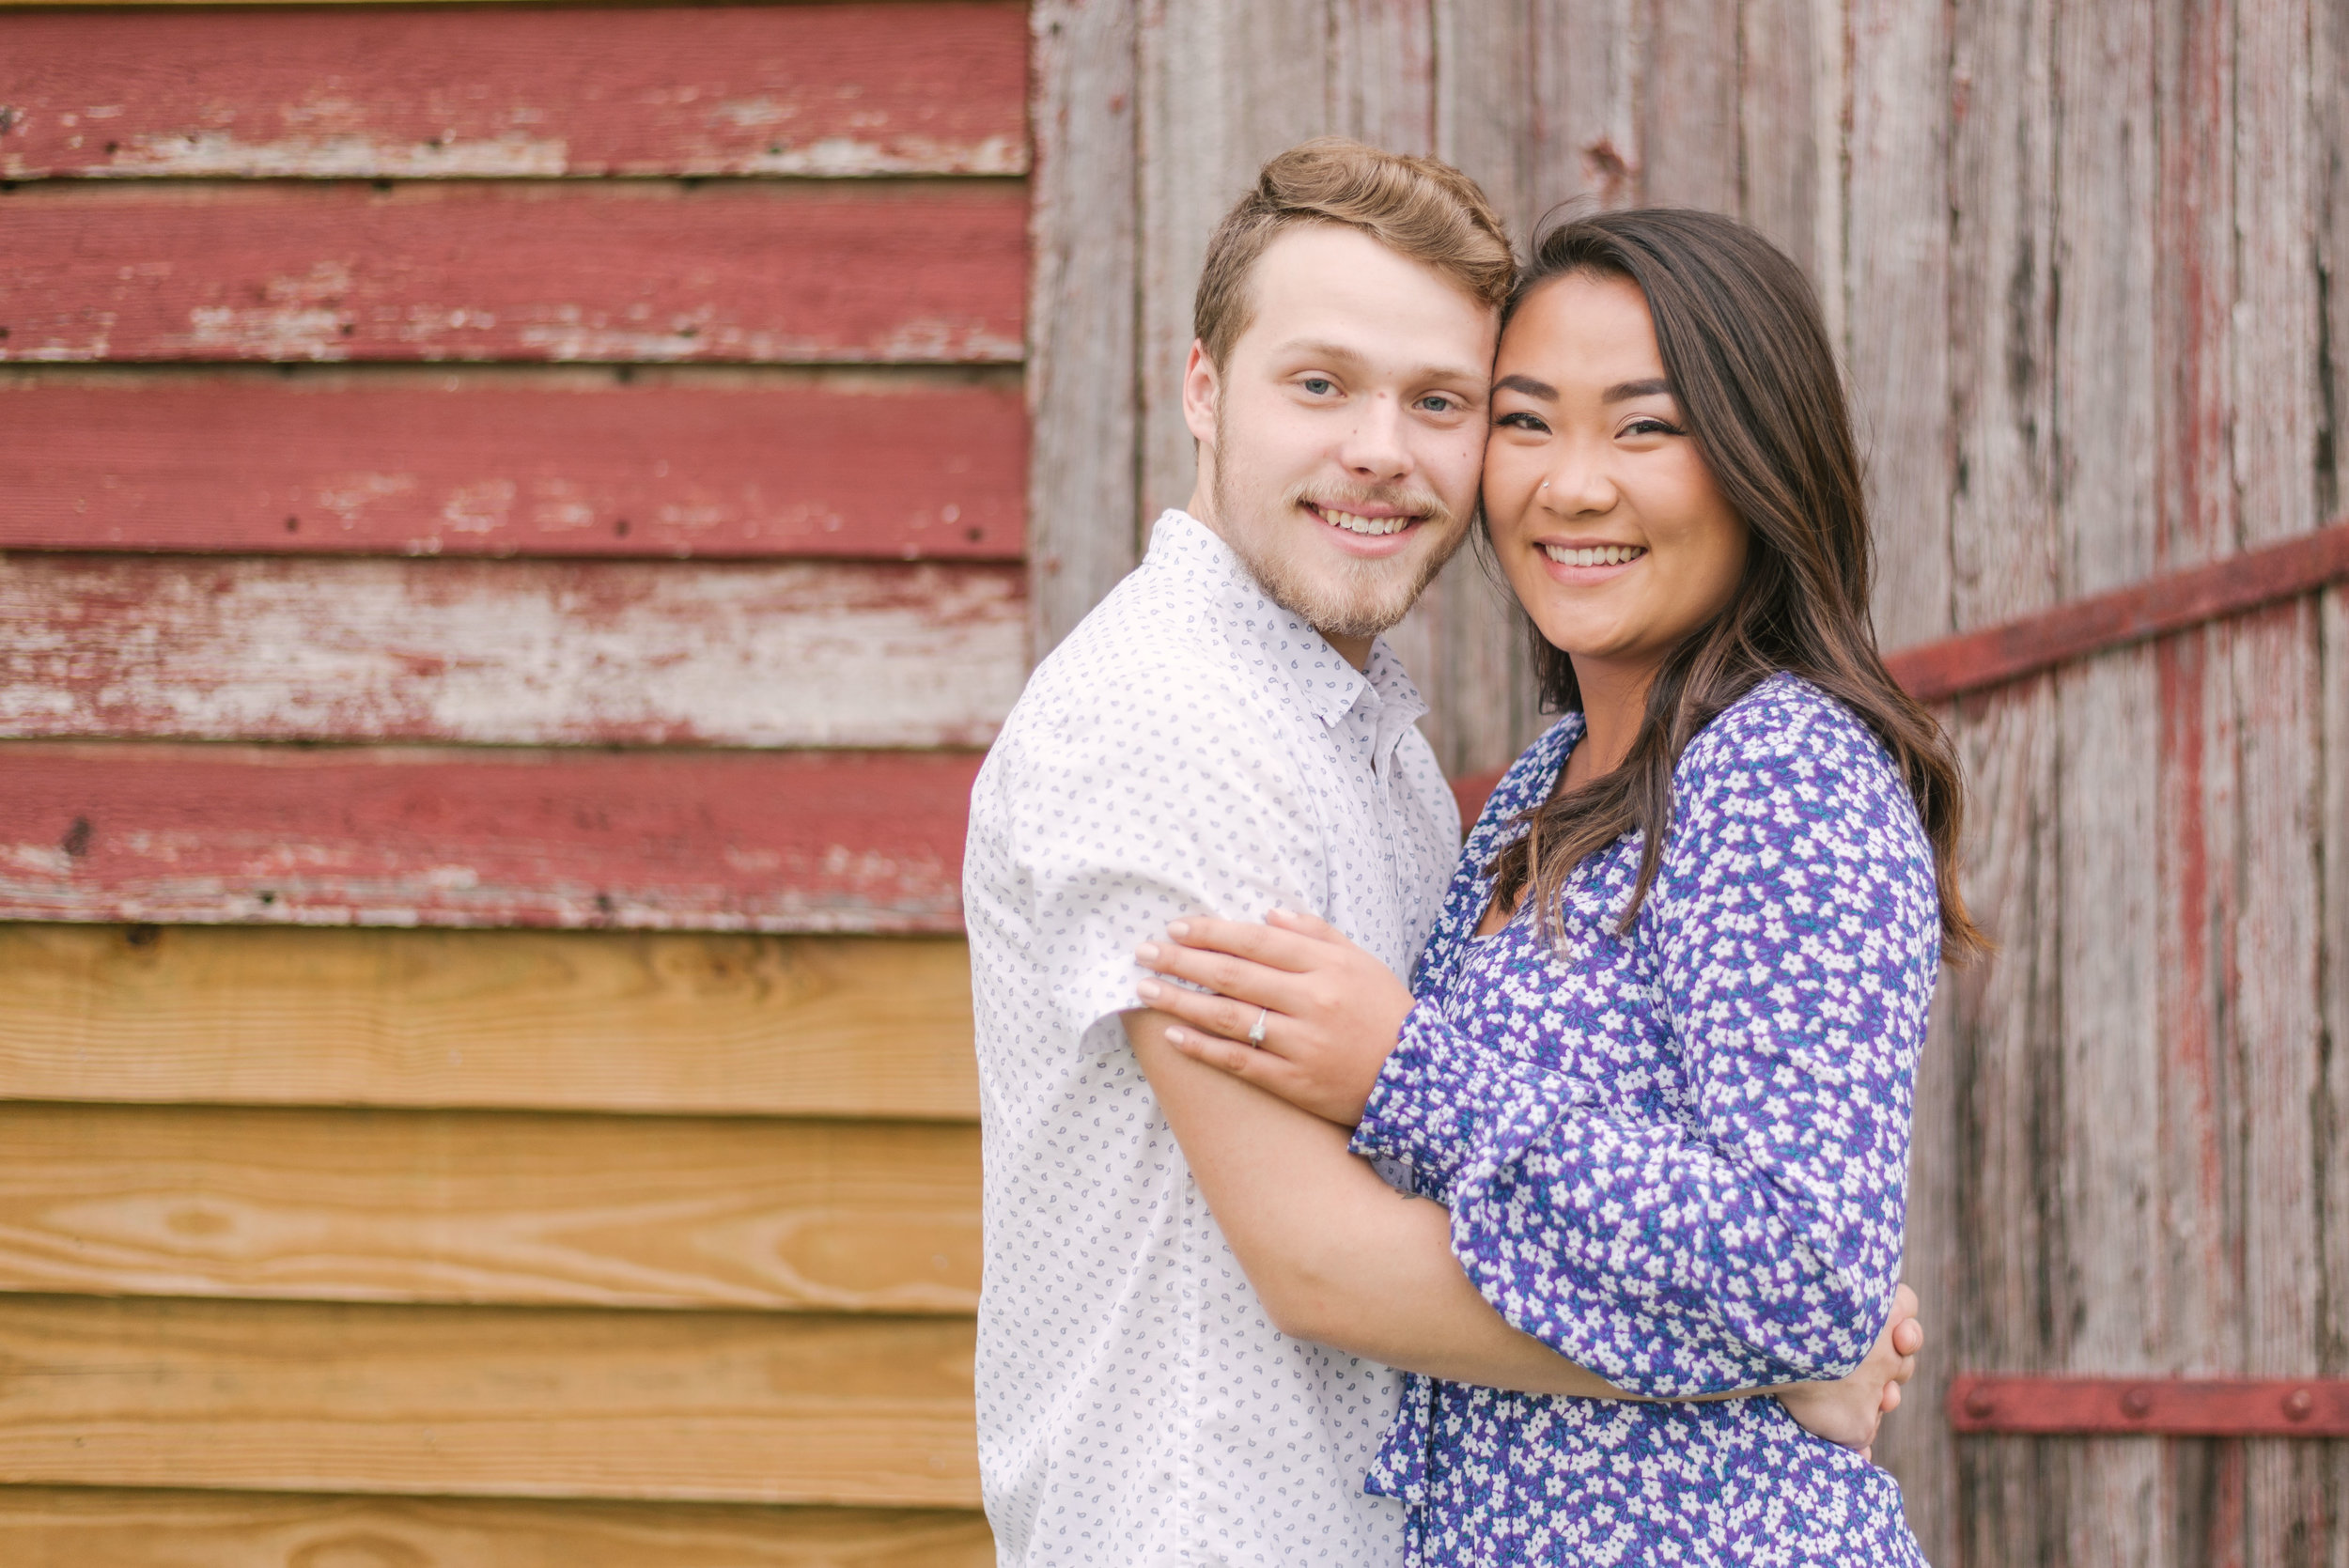 Smithfield Engagement Photographer Brittany Sue Photo-52.jpg